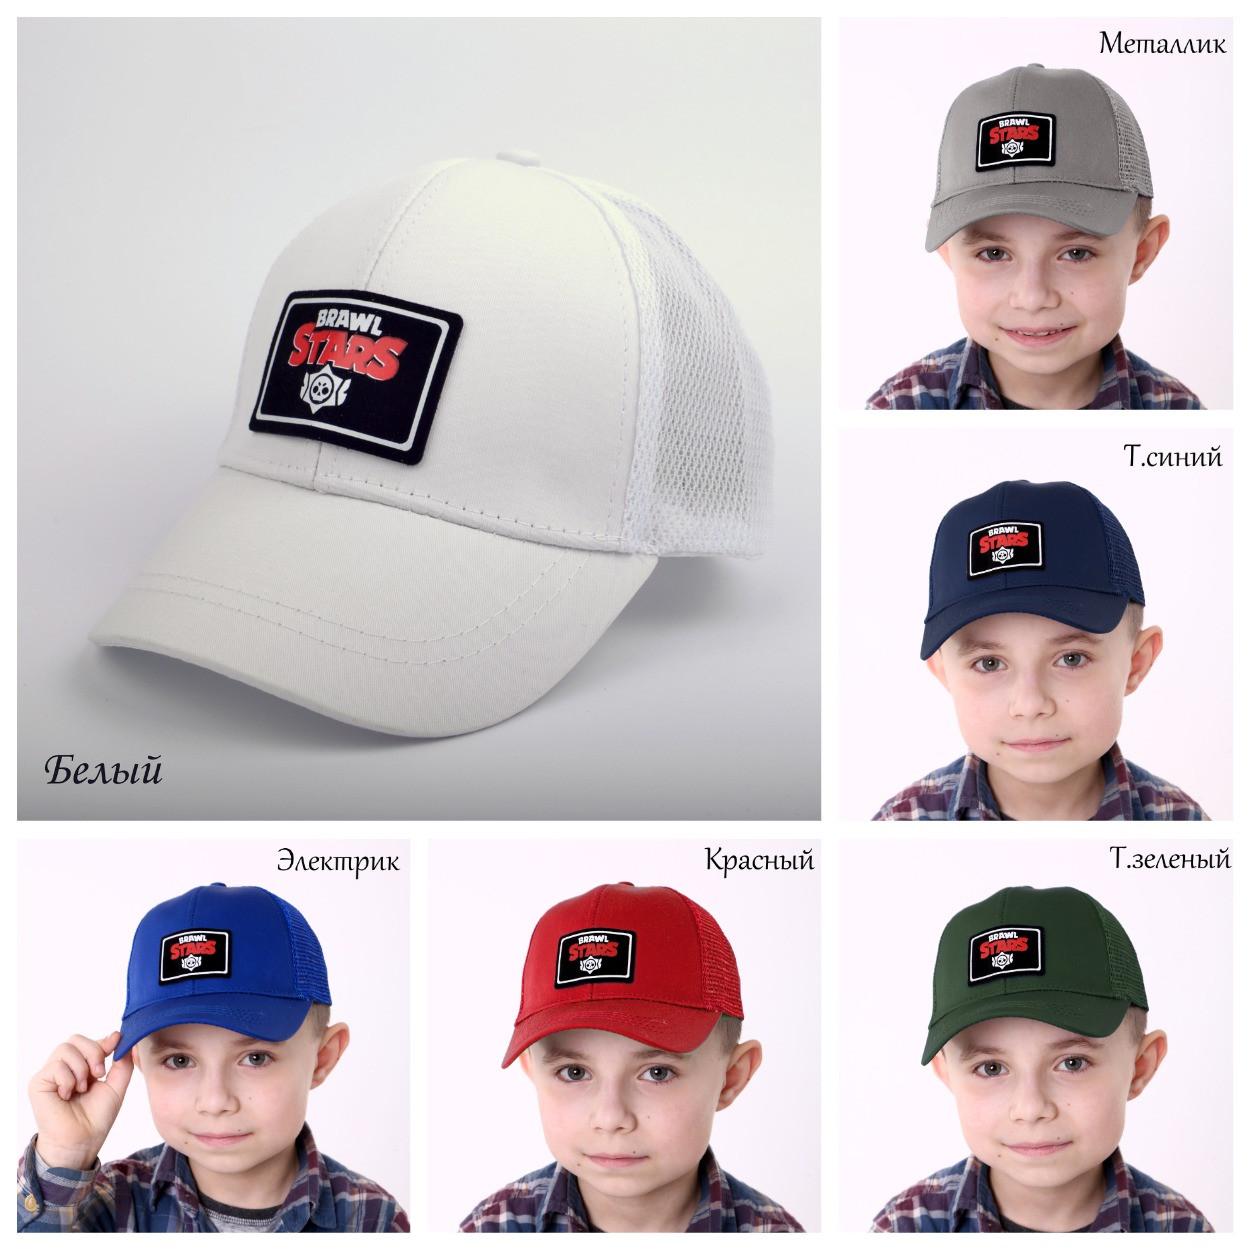 Детская кепка с сеткой Brawl Stars Бравл стар размер 52 на 3 - 6 лет